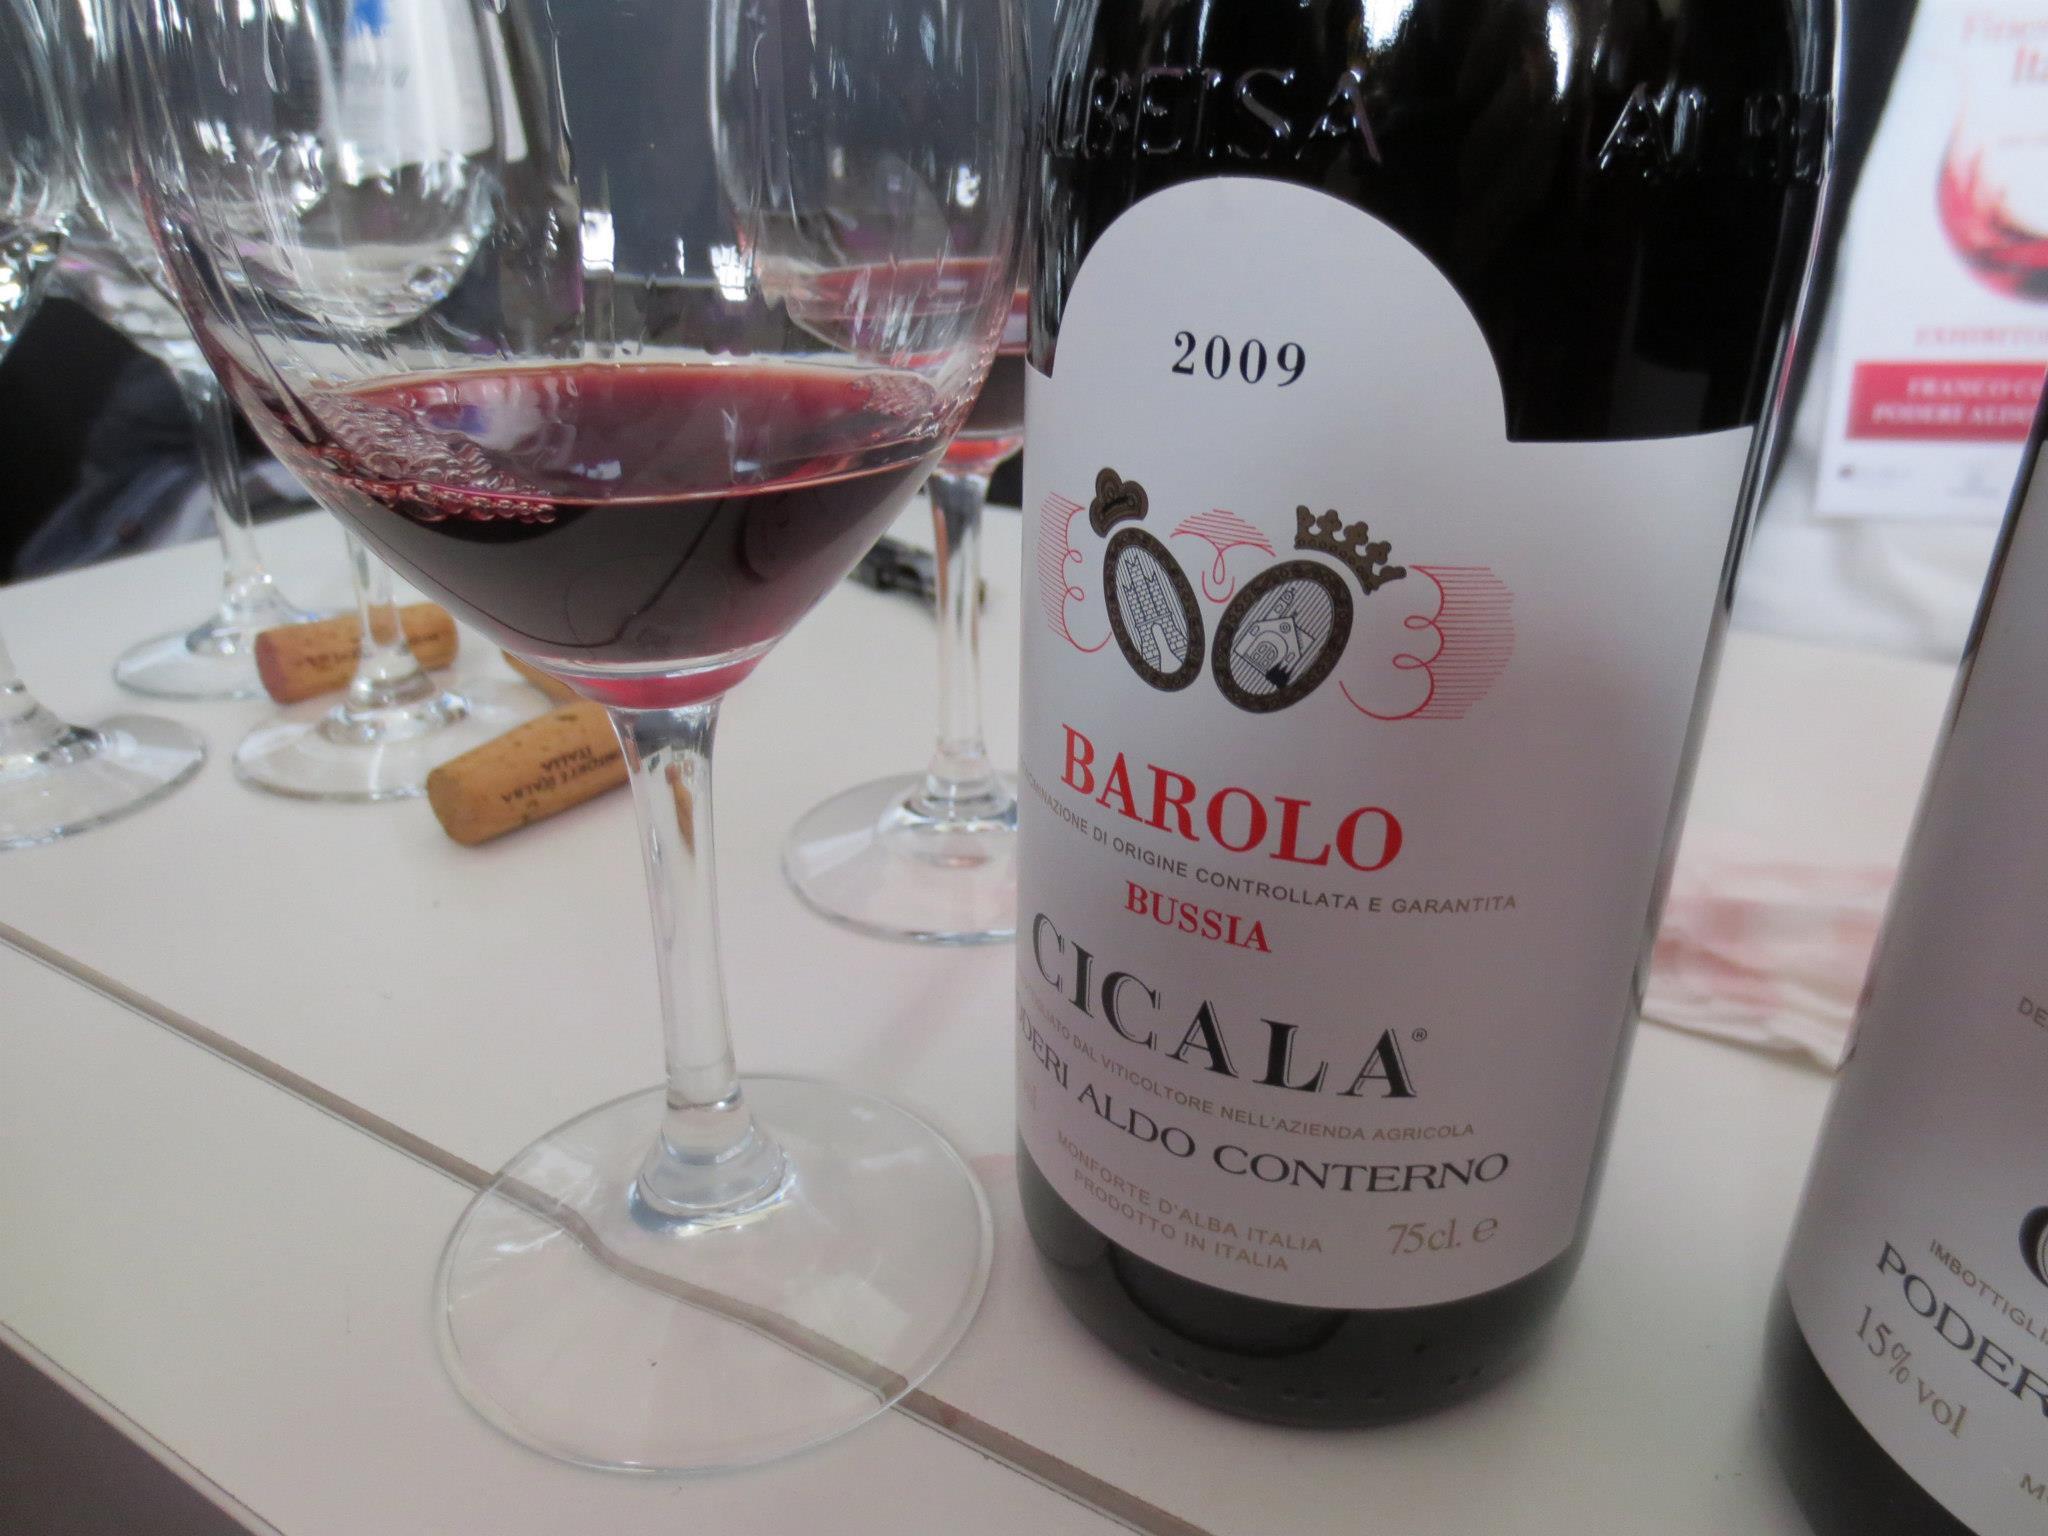 Aldo Conterno Cicala Bussia Barolo